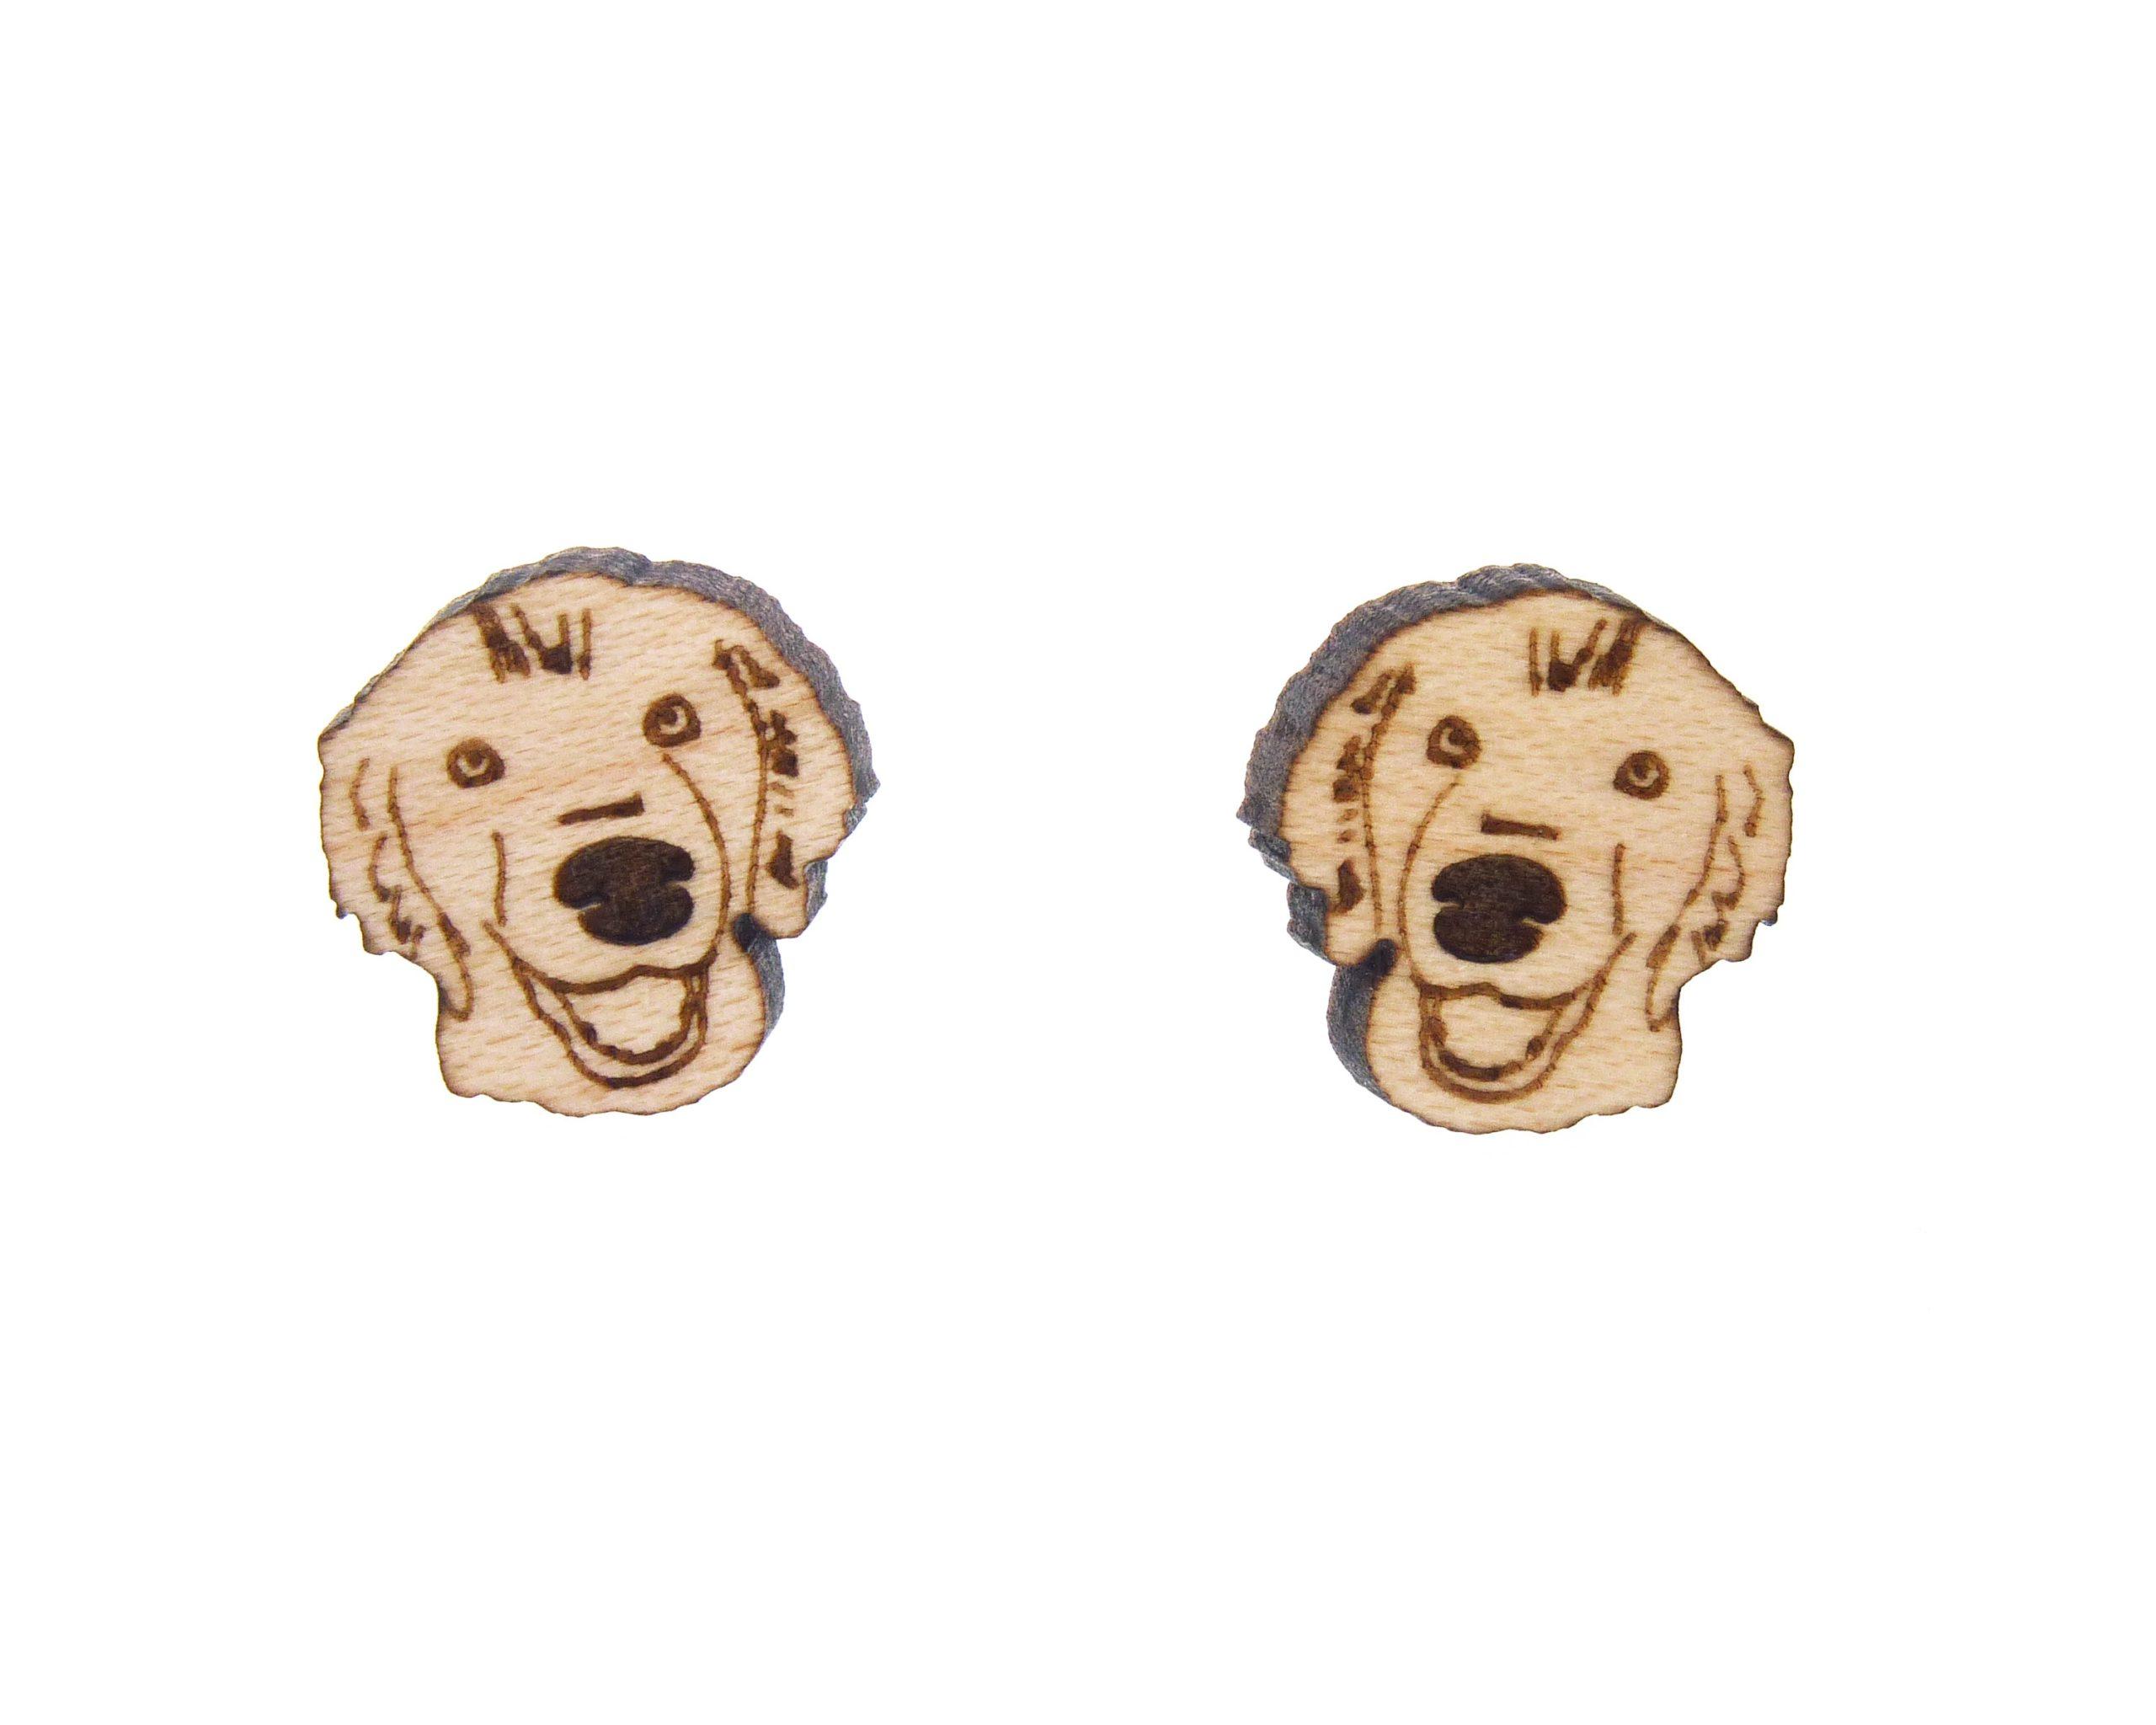 Golden Retriever Dog Larger Wood Stud Earrings   Hand Drawn